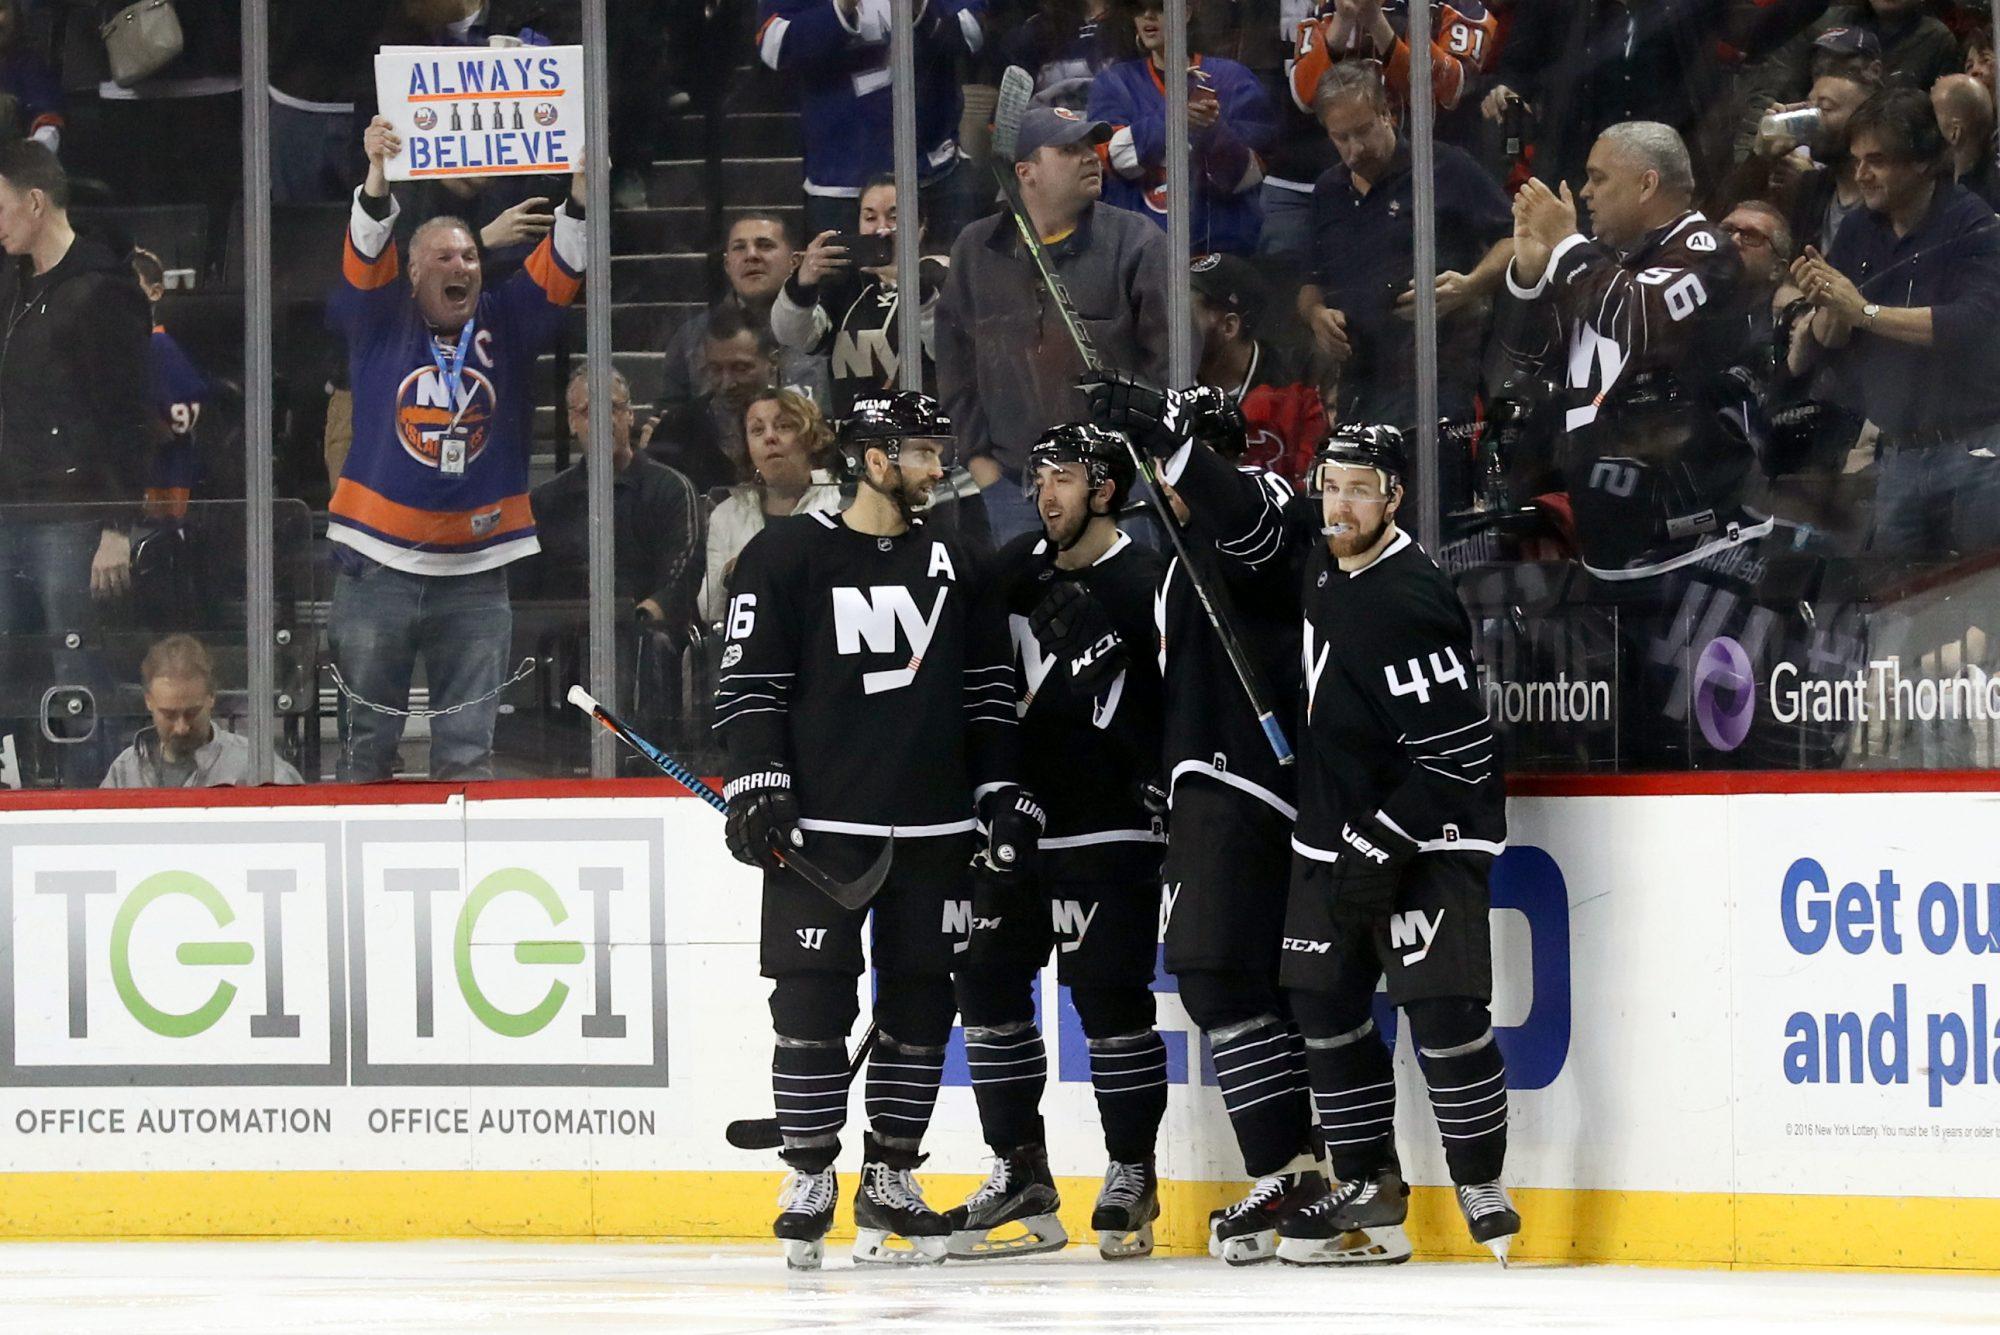 Despite trade deadline silence, New York Islanders remain in playoff hunt